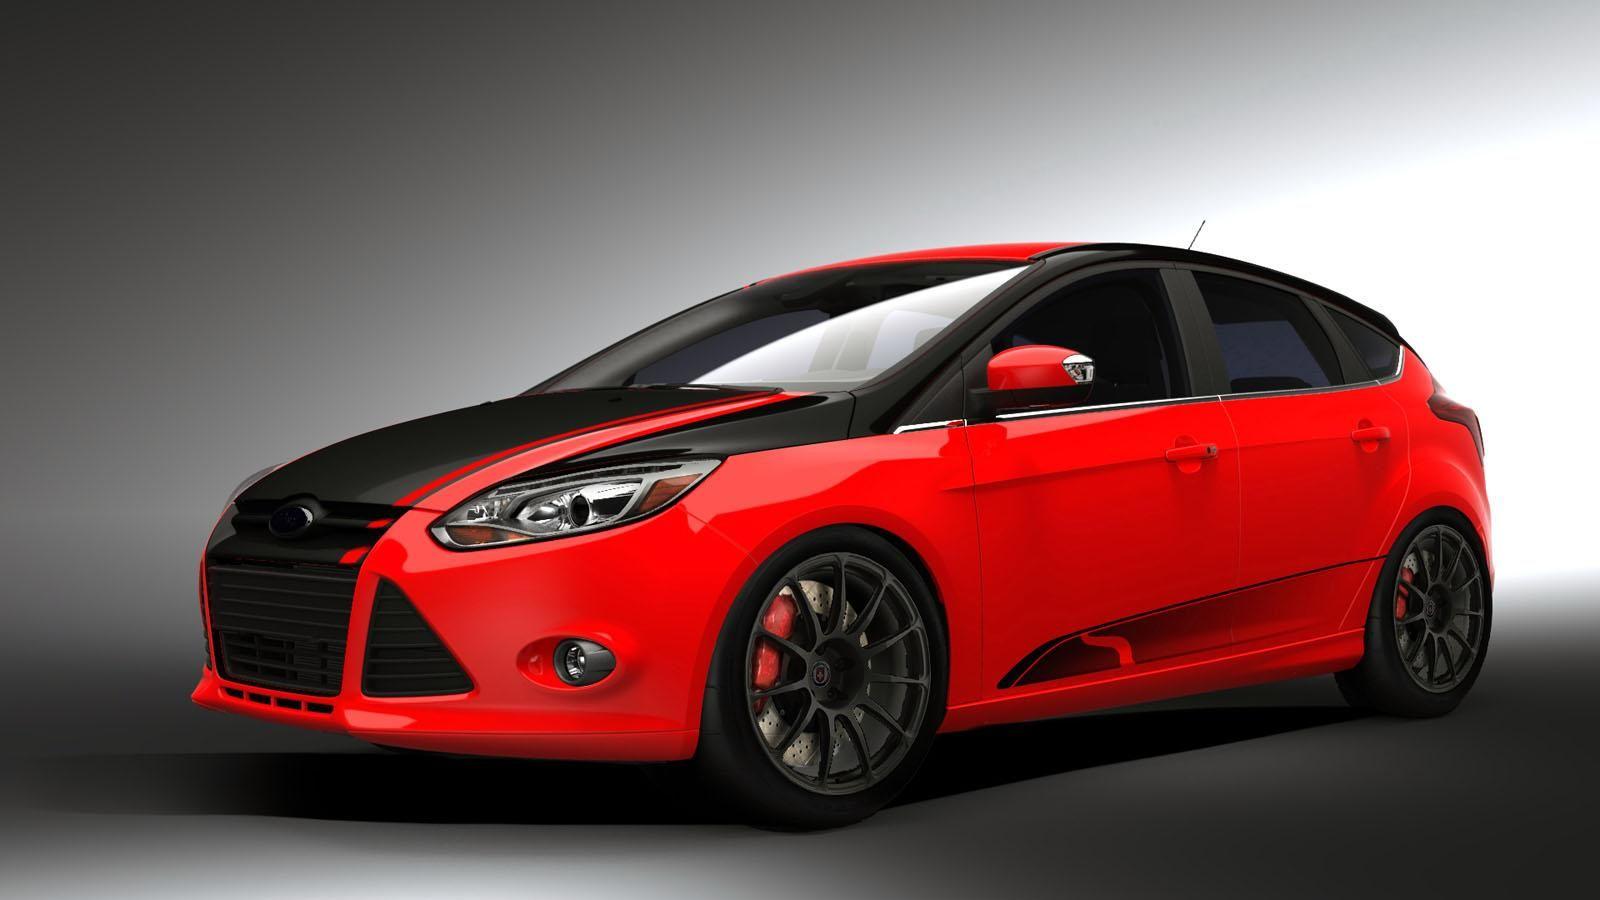 Modif Ford Focus Merah